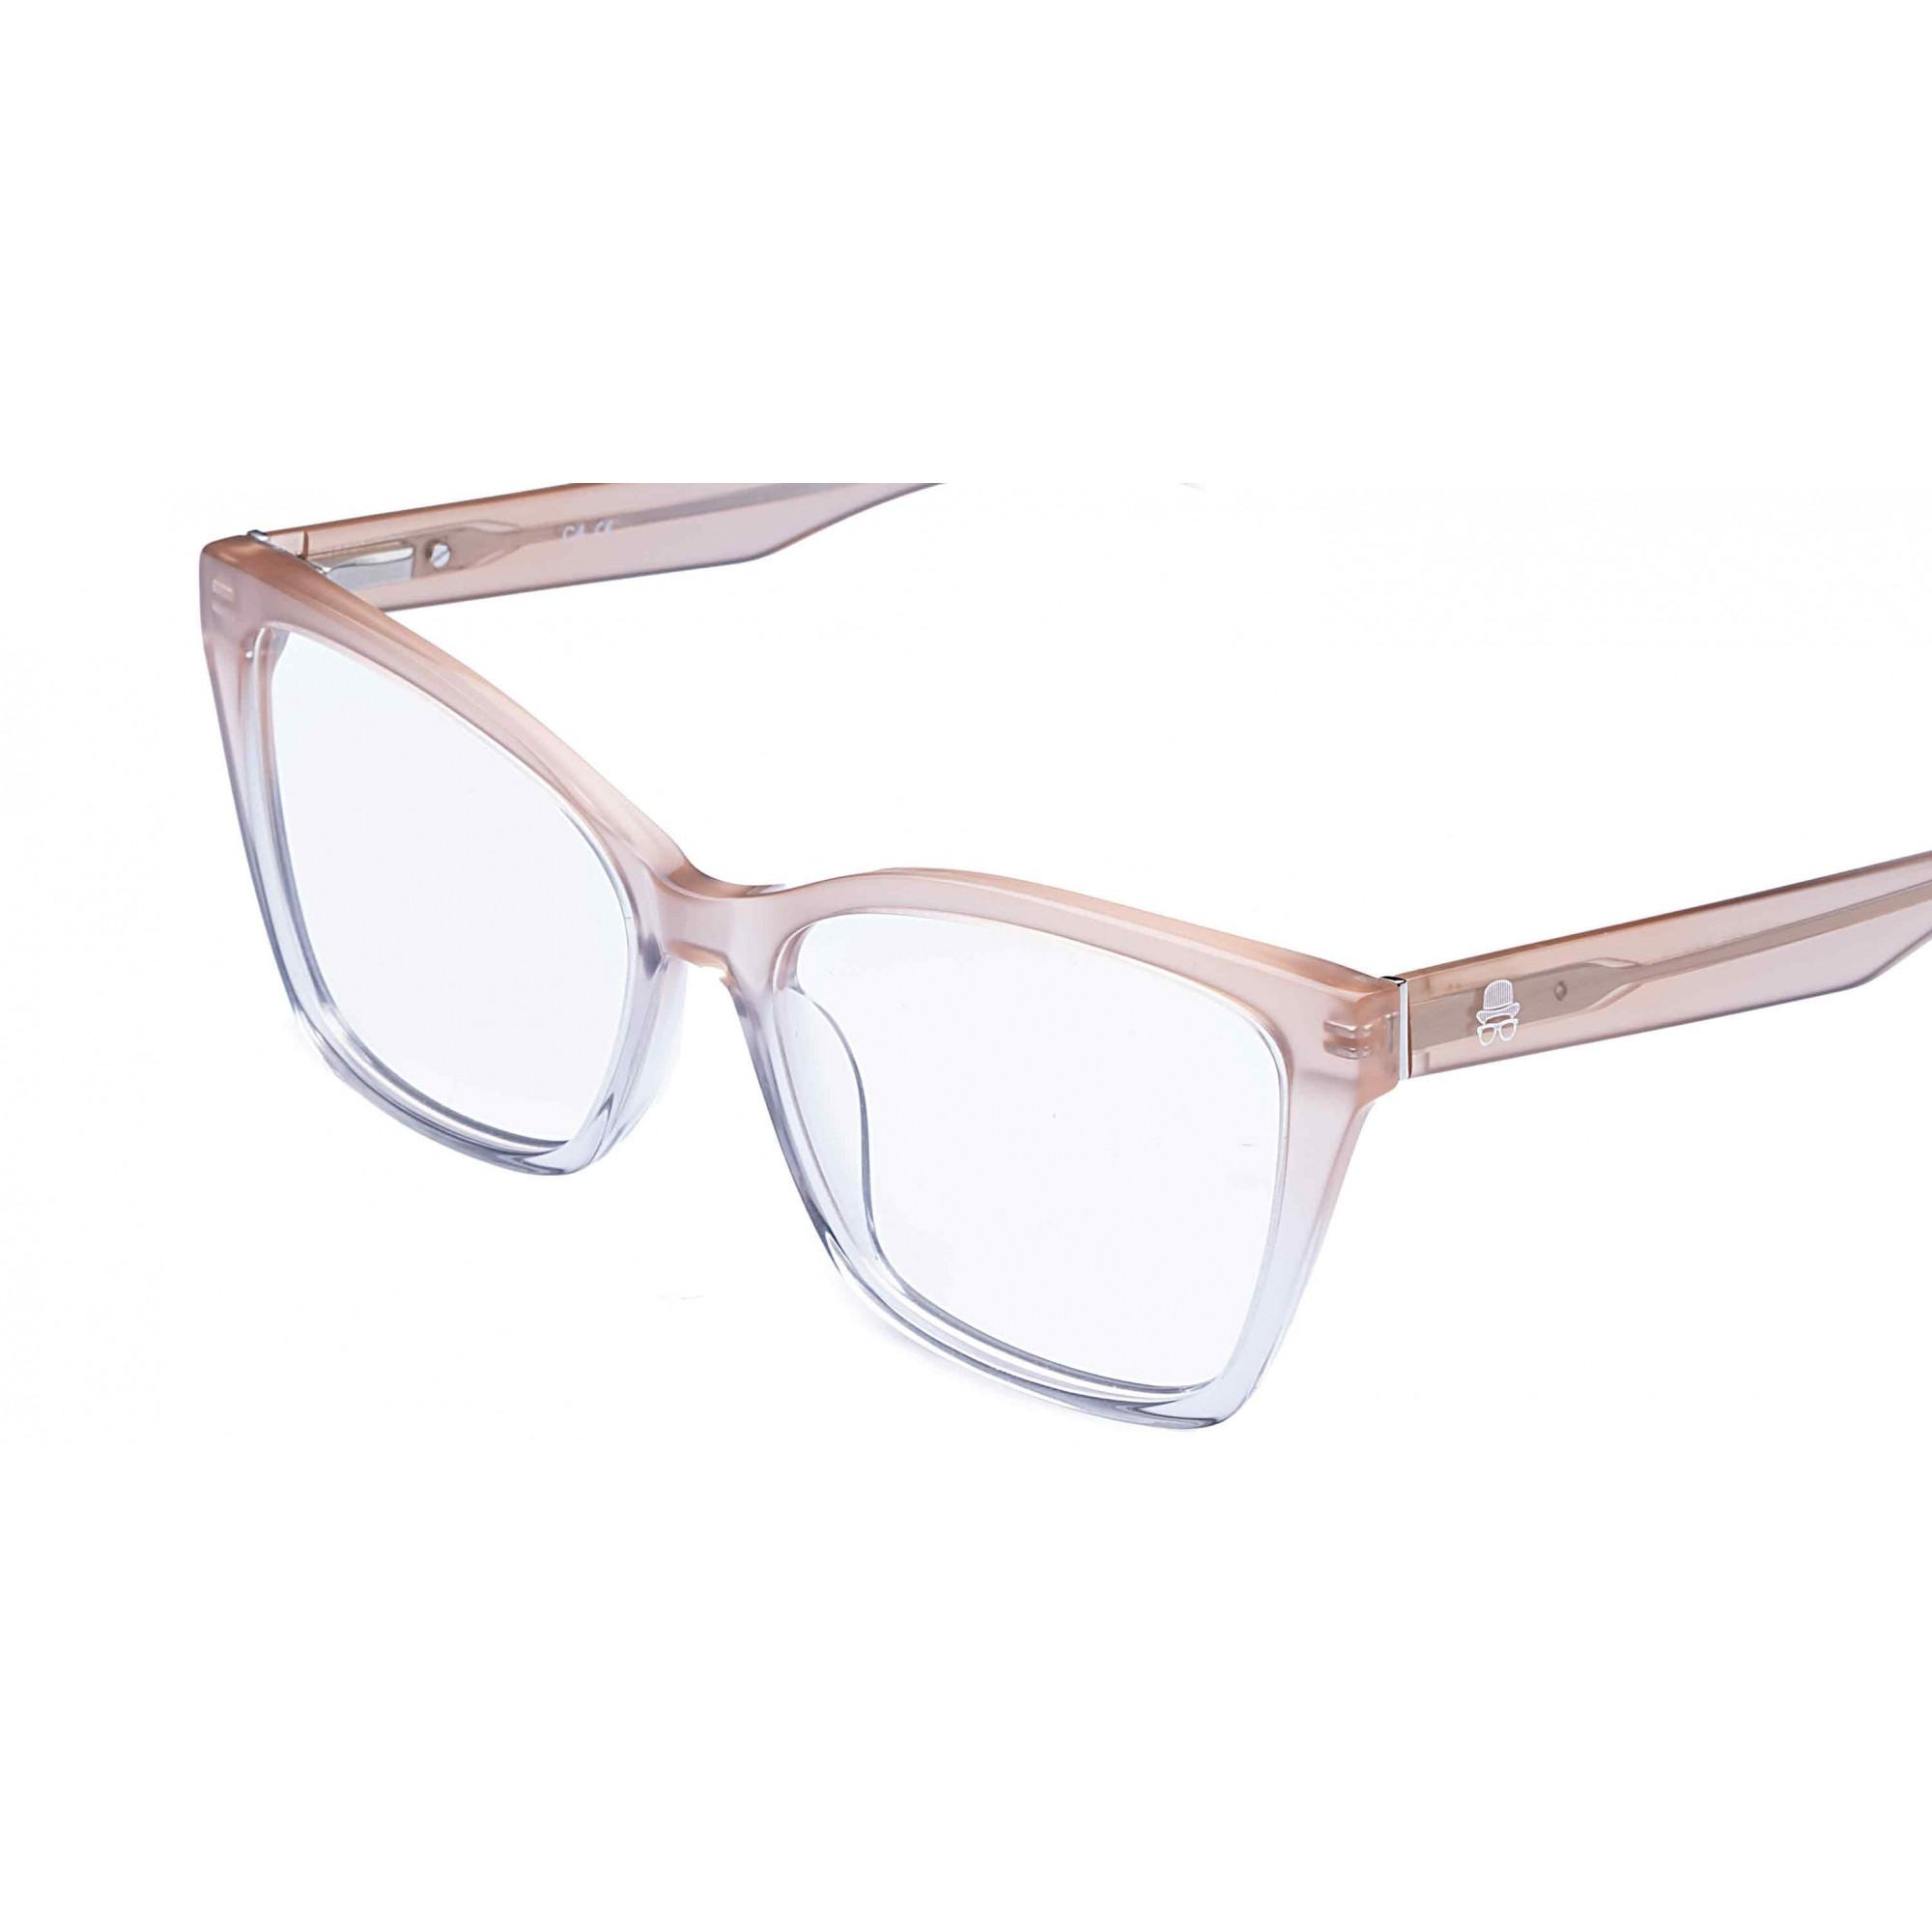 Crystal - Rafael Lopes Eyewear